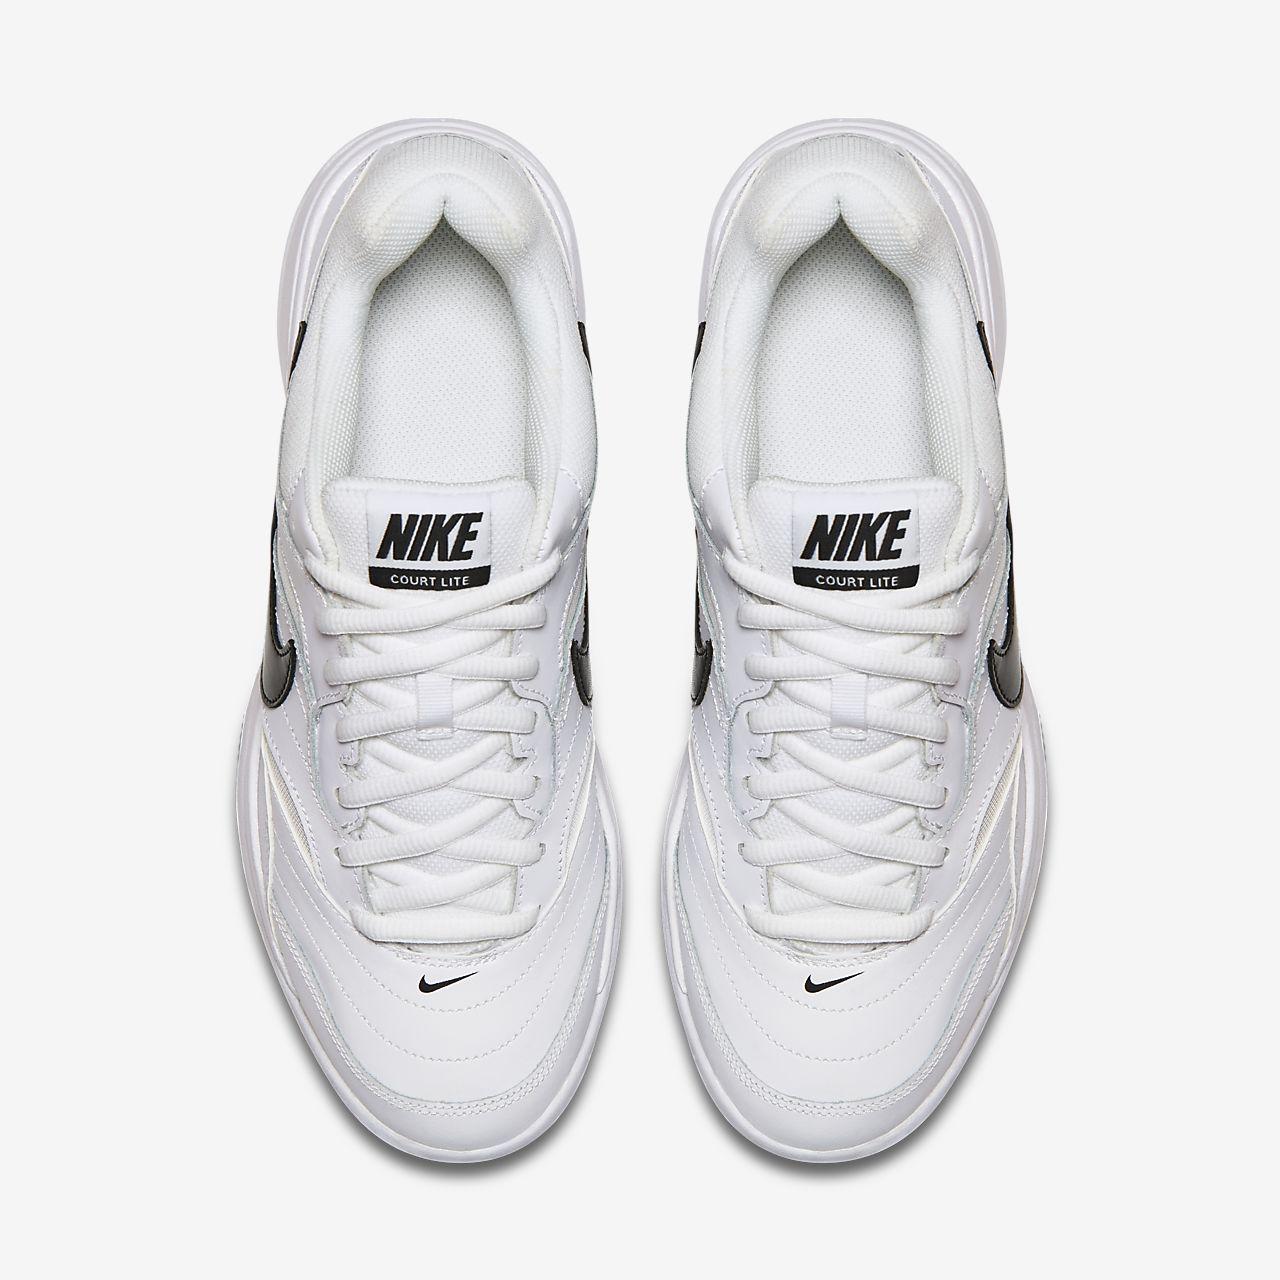 b84c272f60e NikeCourt Lite Men s Hard Court Tennis Shoe. Nike.com